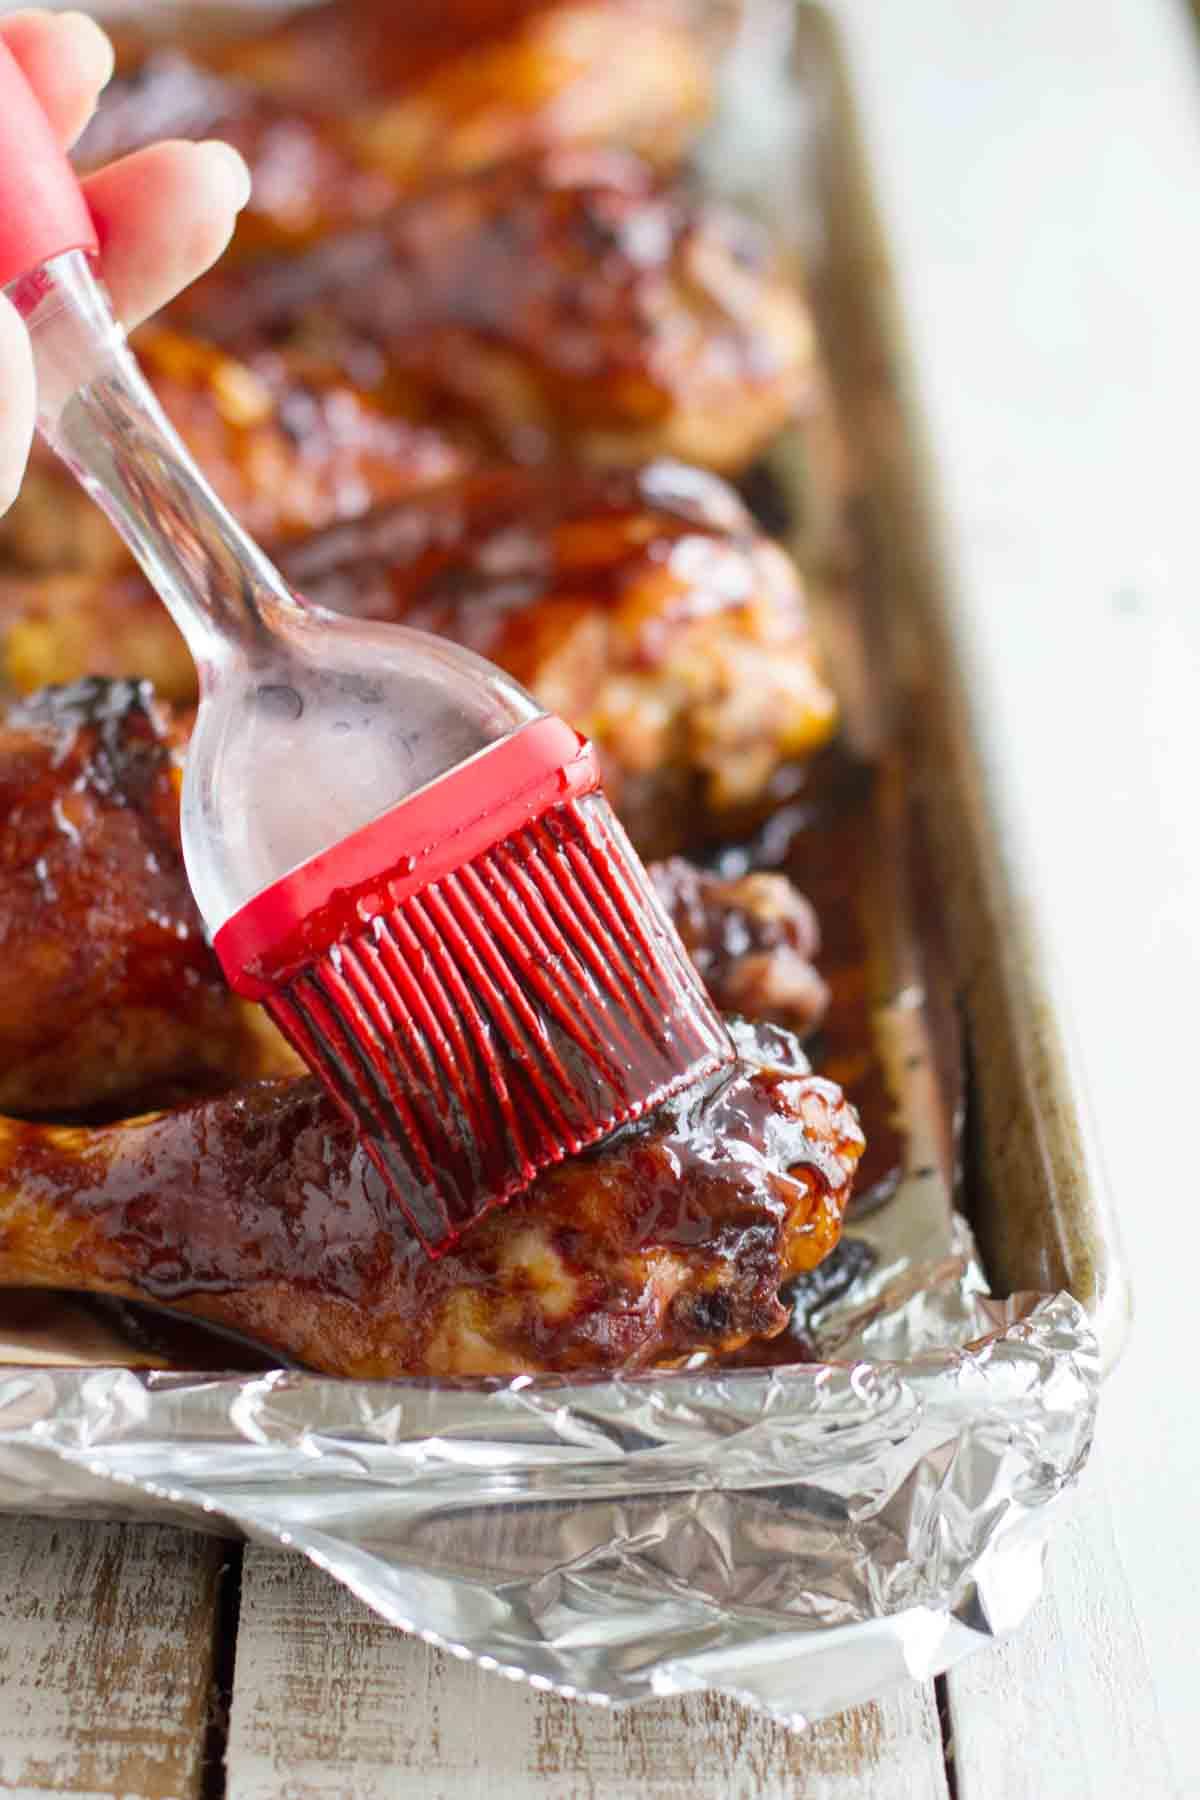 brushing sauce on chicken drumsticks